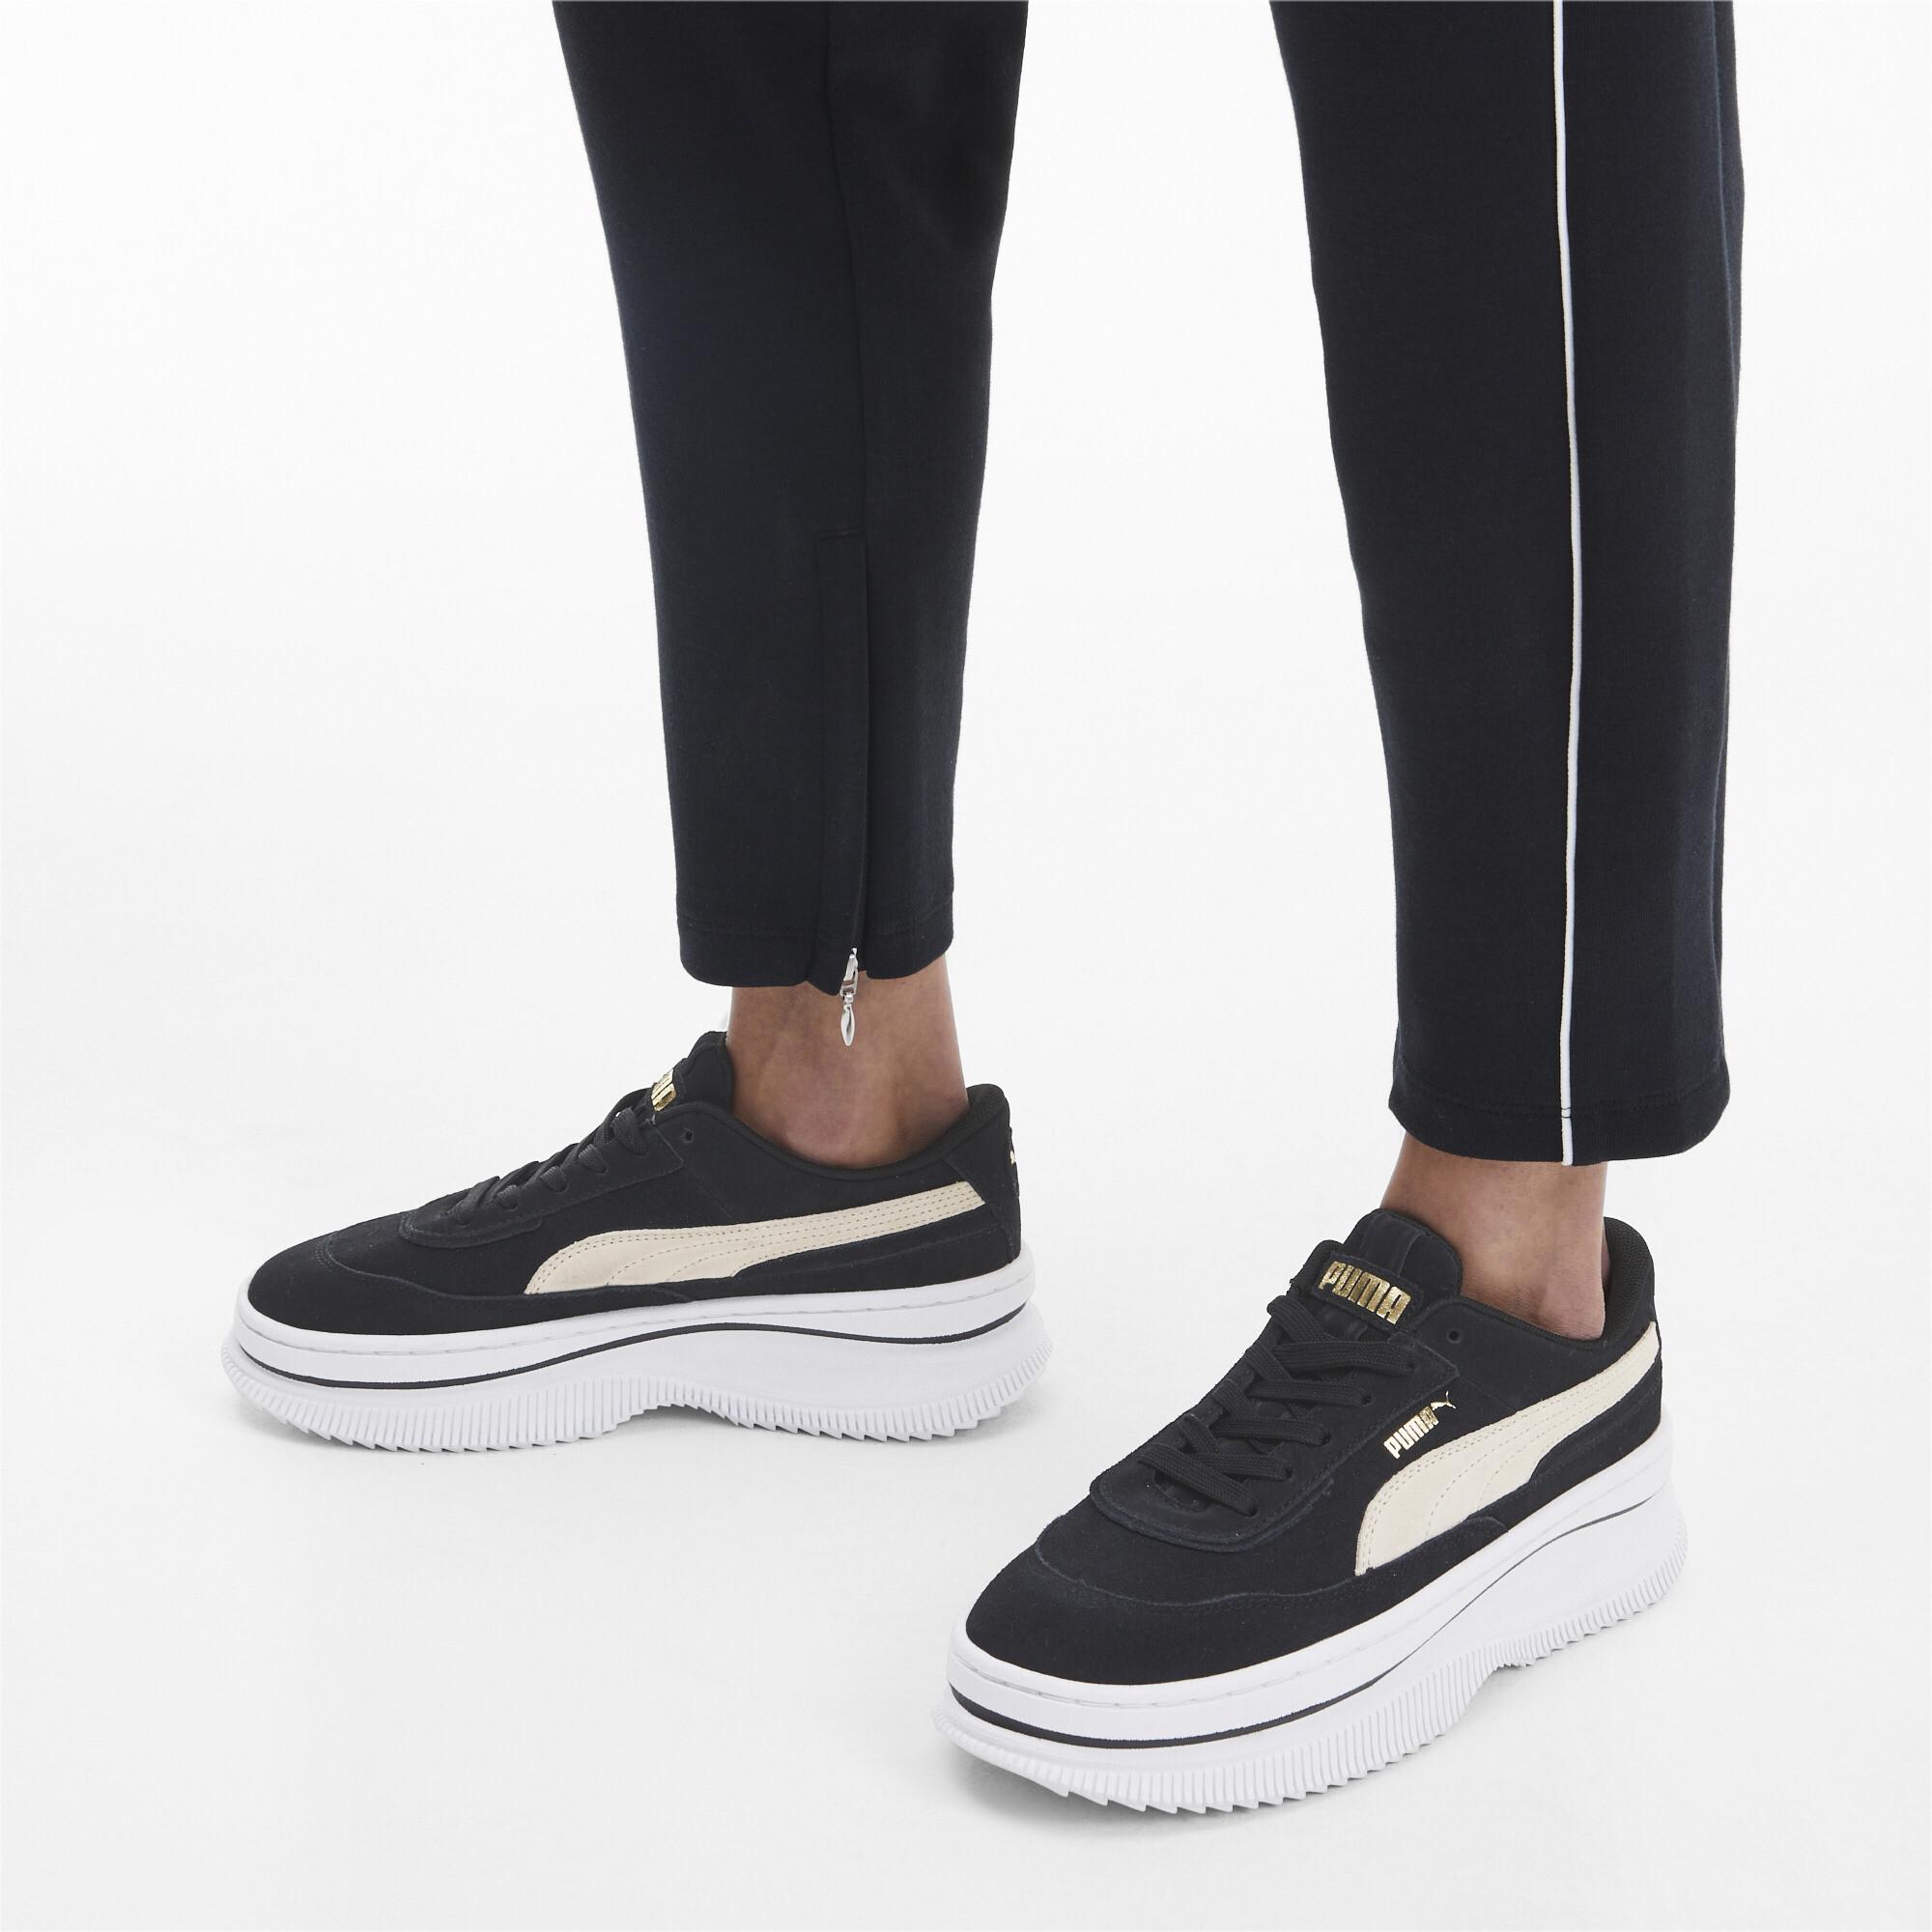 PUMA-Women-039-s-DEVA-Suede-Sneakers thumbnail 5